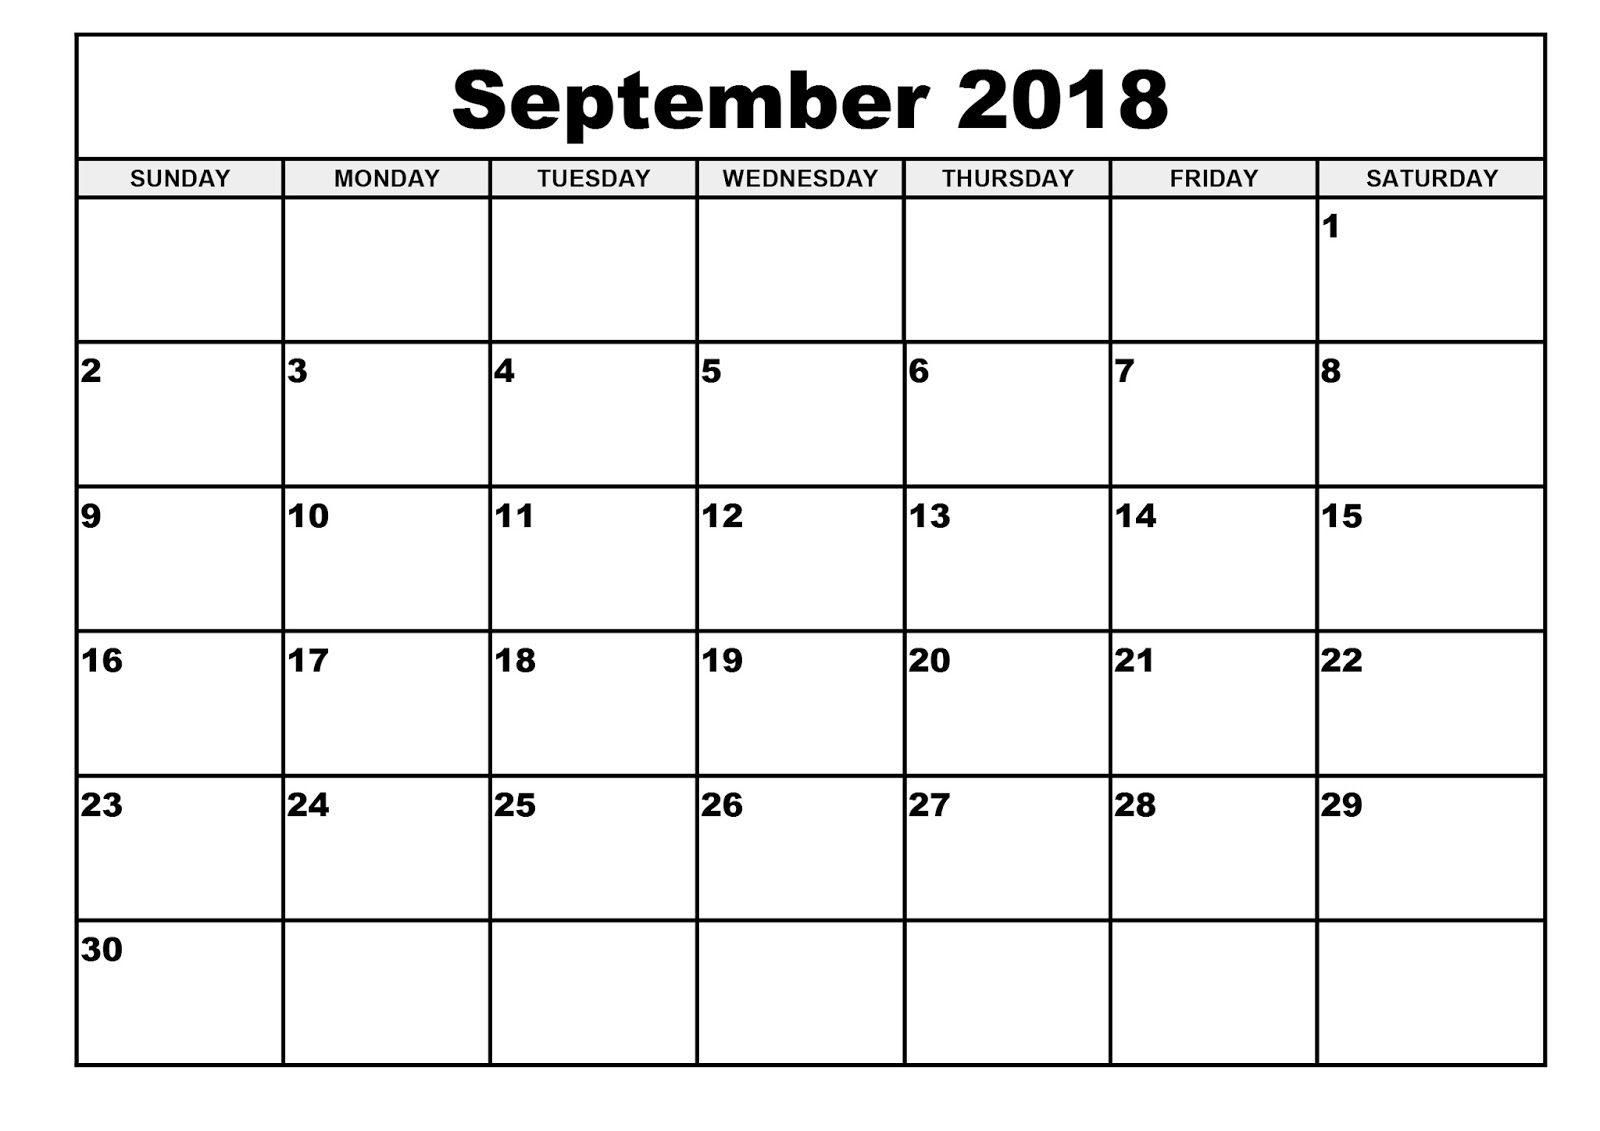 September 2018 Monthly Schedule Calendar Printable September 2018